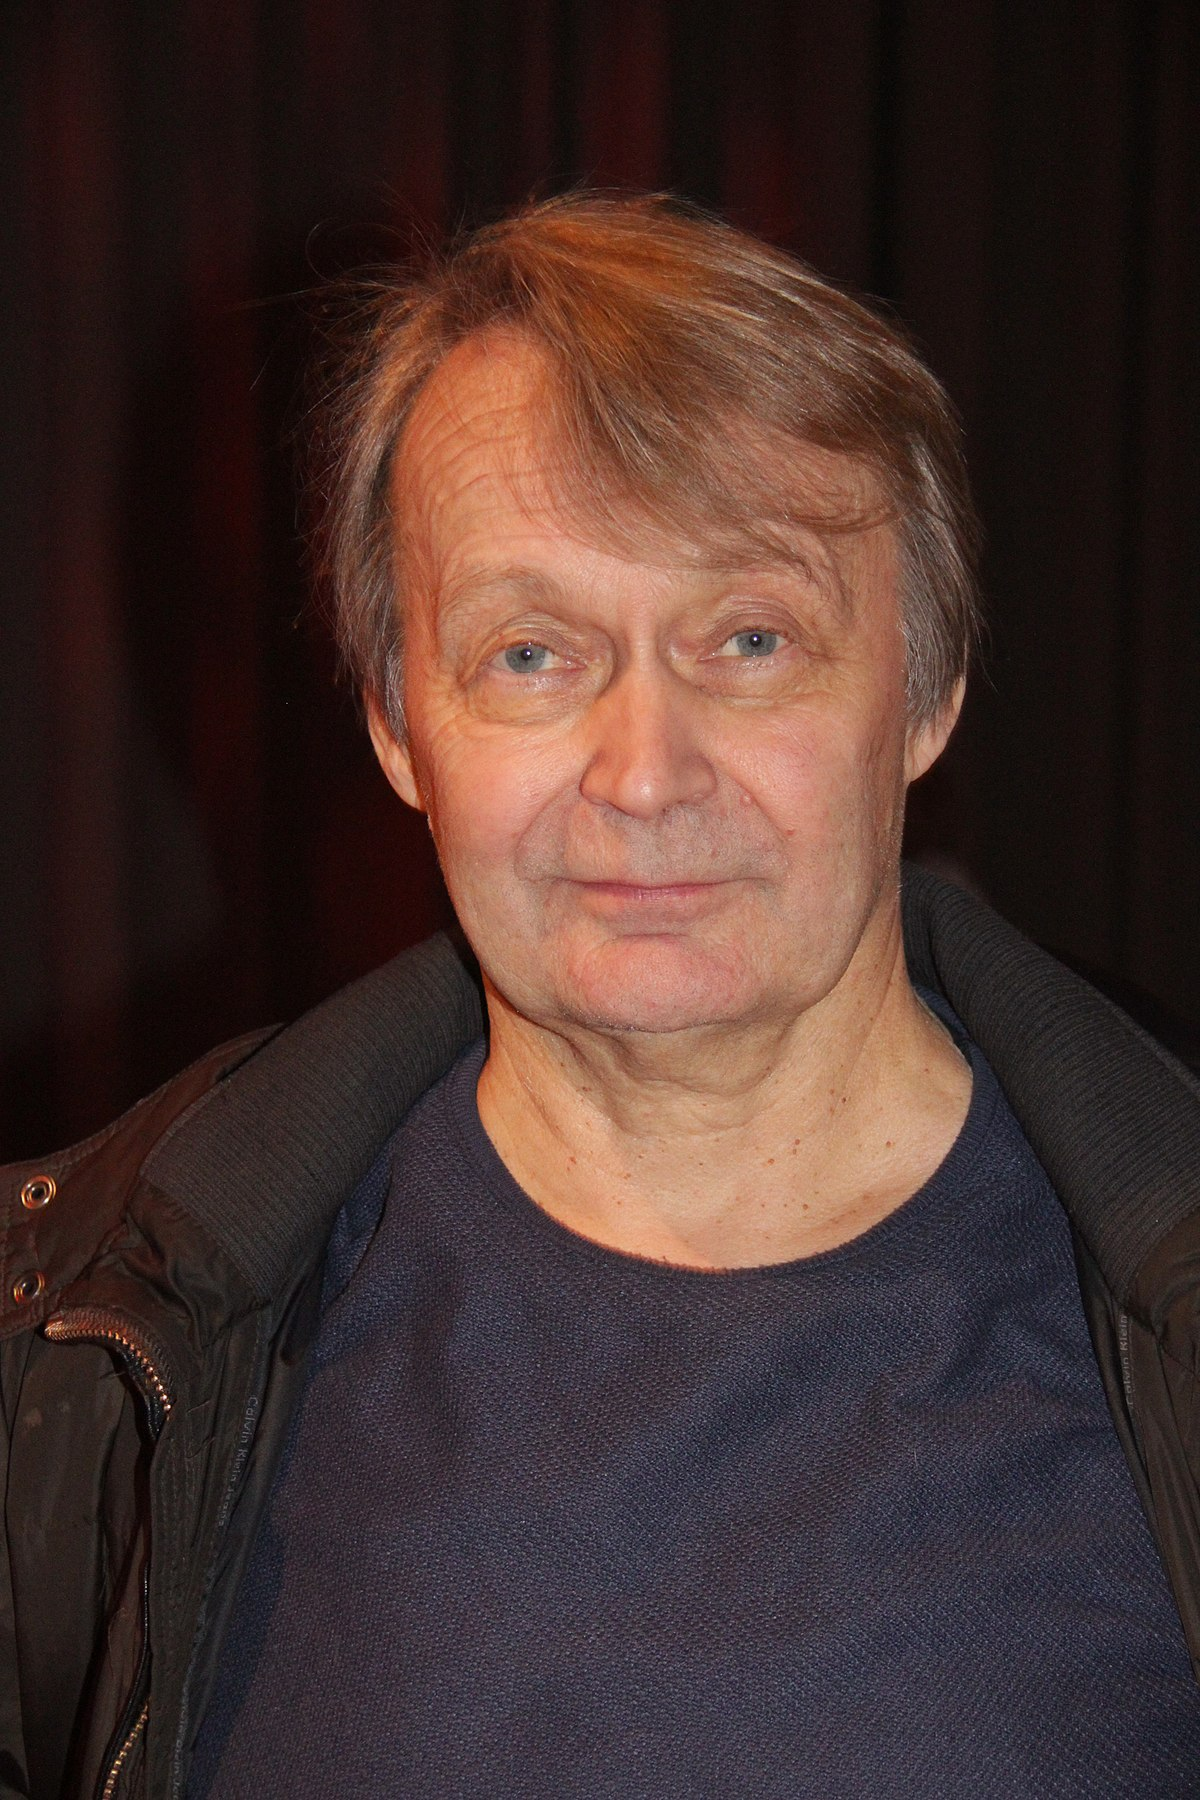 Nils Gaup - Wikipedia